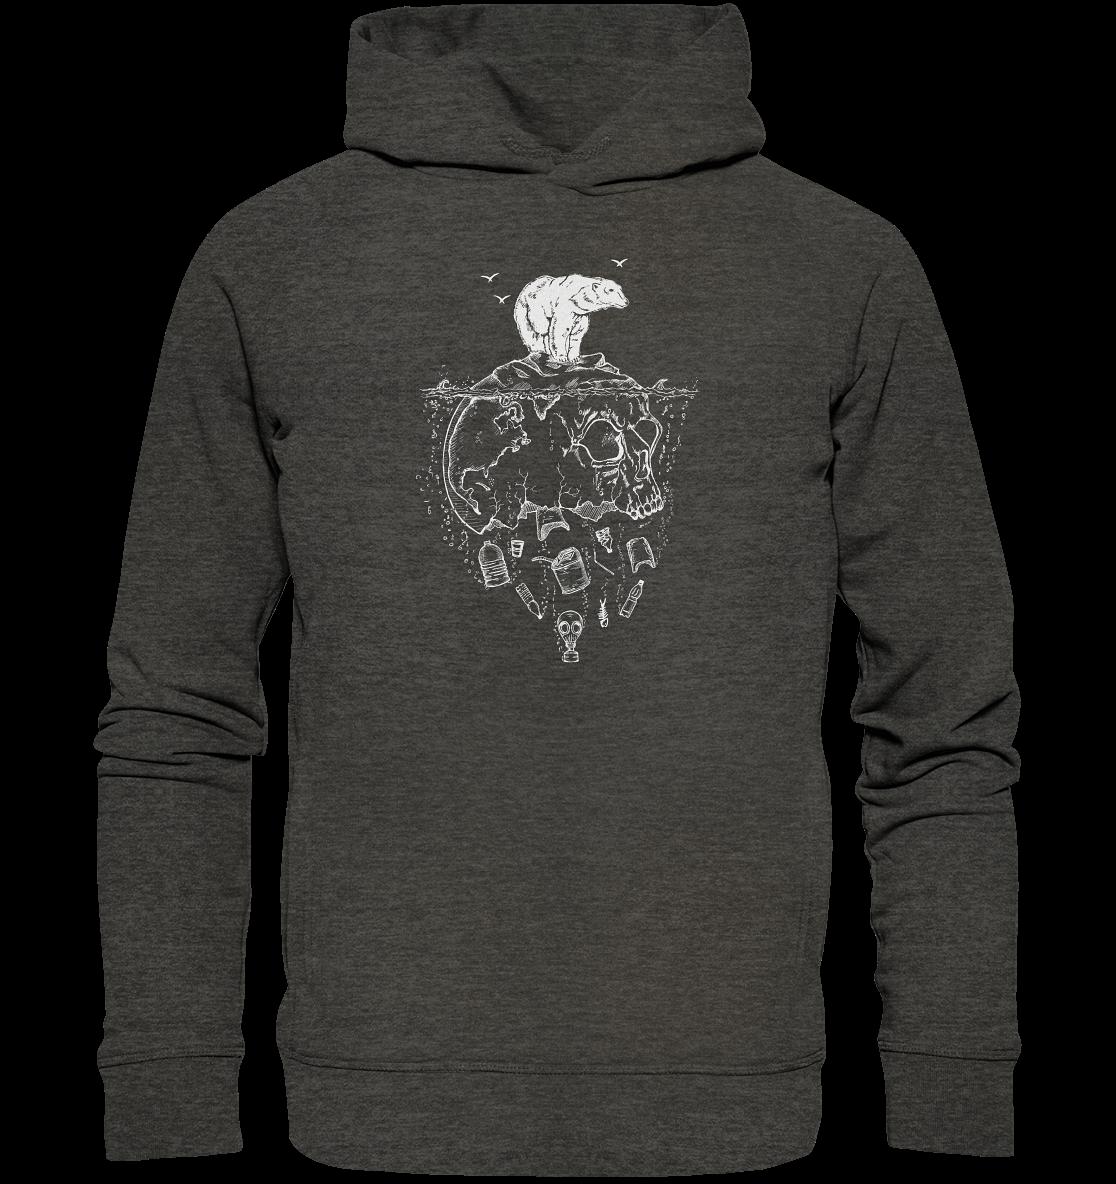 front-organic-fashion-hoodie-252625-1116x-5.png